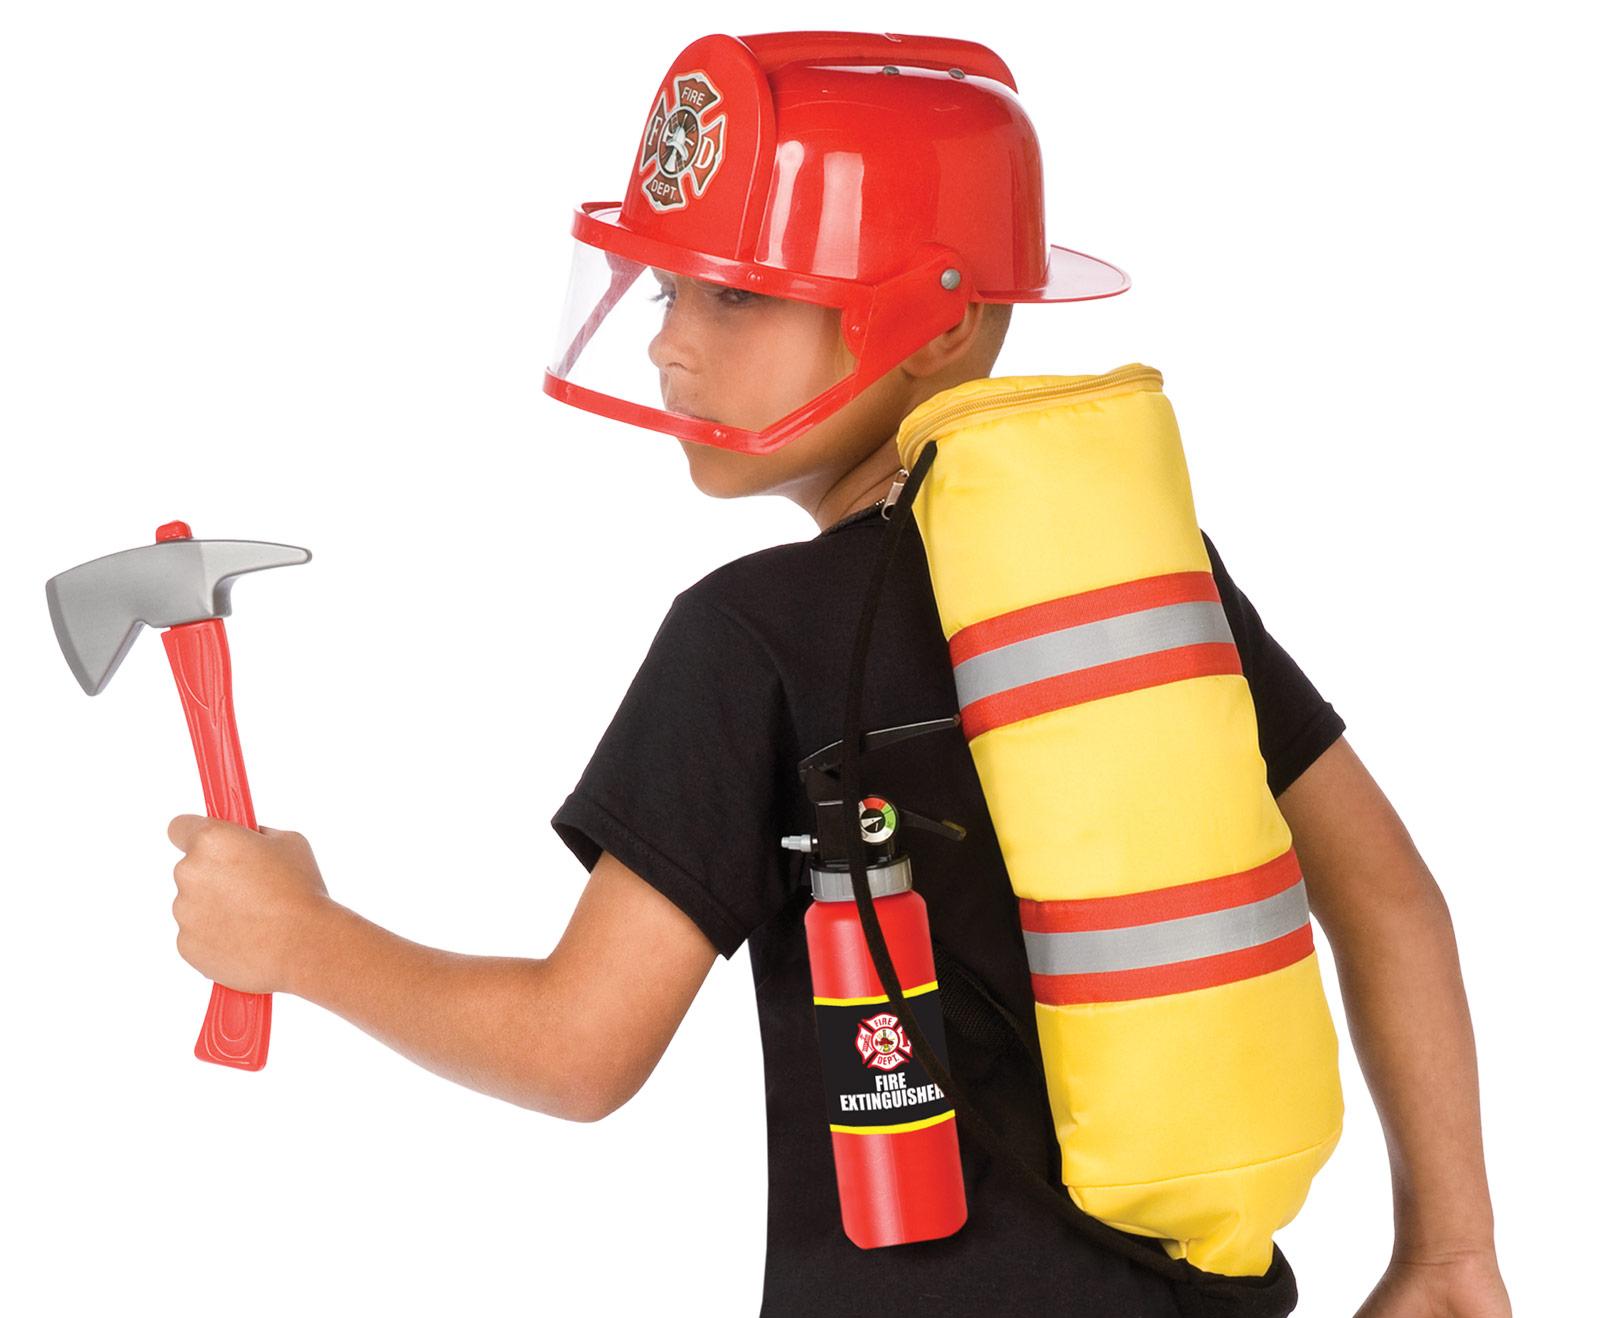 Fireman Child Accessory Kit Gear To Go Fireman Adventure Play Set Bc